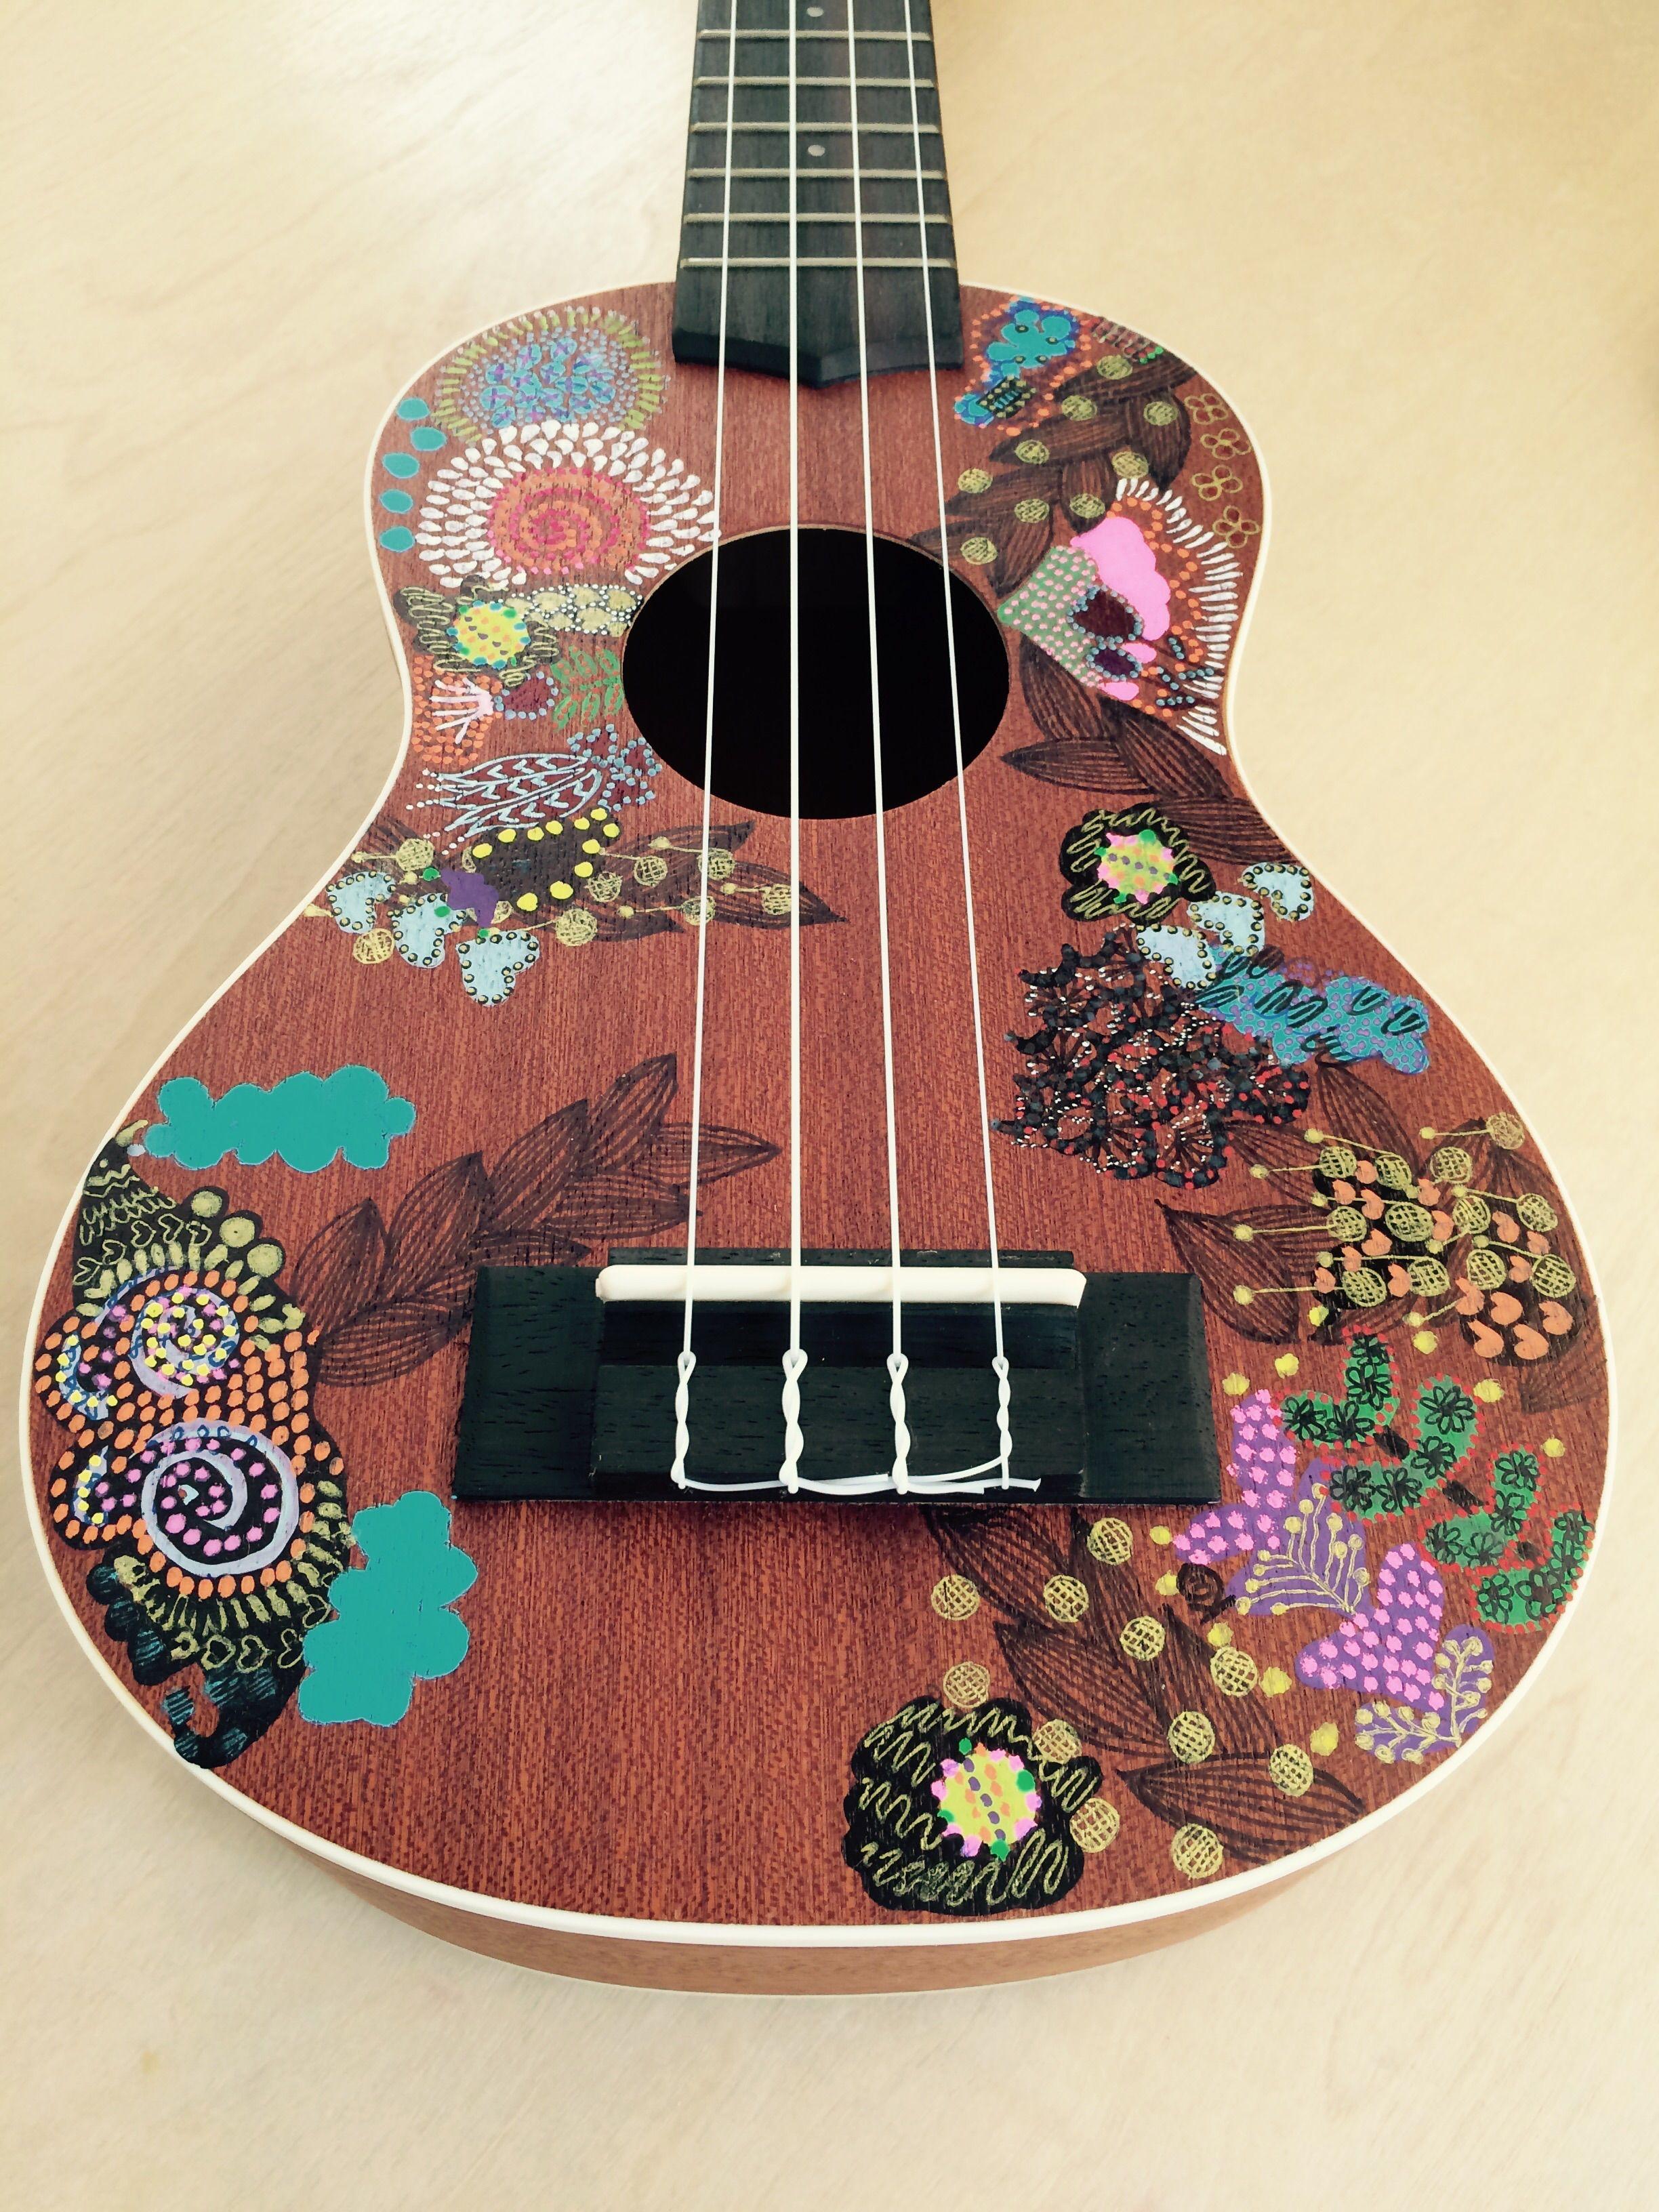 Flower Power Quot Hand Painted Ukulele Felt Painted Ukulele Ukulele Design Ukulele Art